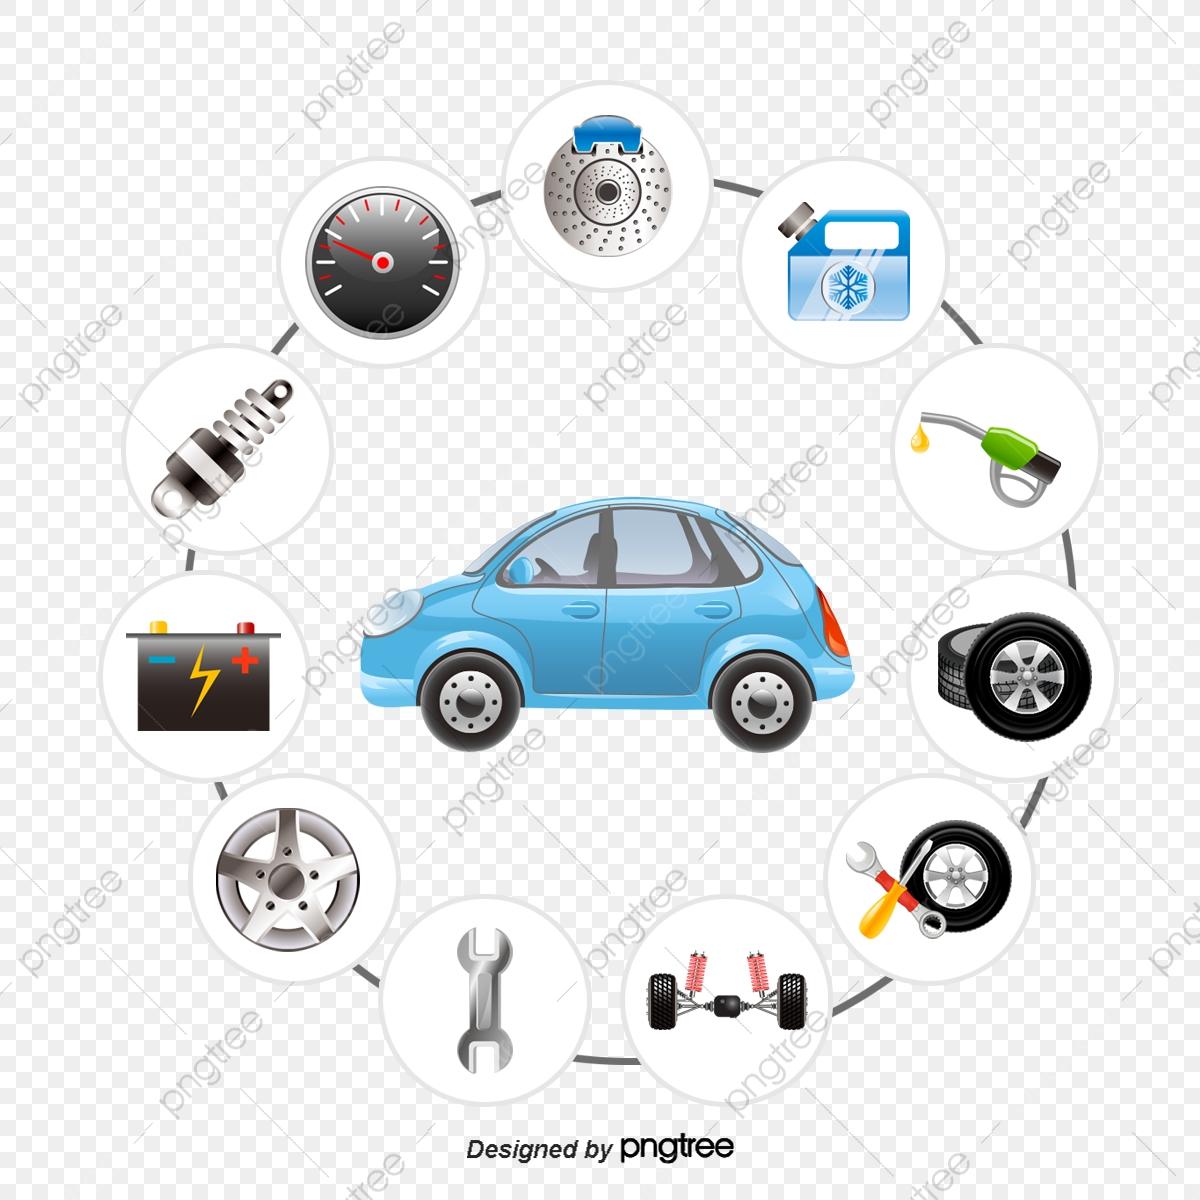 Vector Cars And Auto Parts, Vector Diagram, Car, Car Parts PNG and.